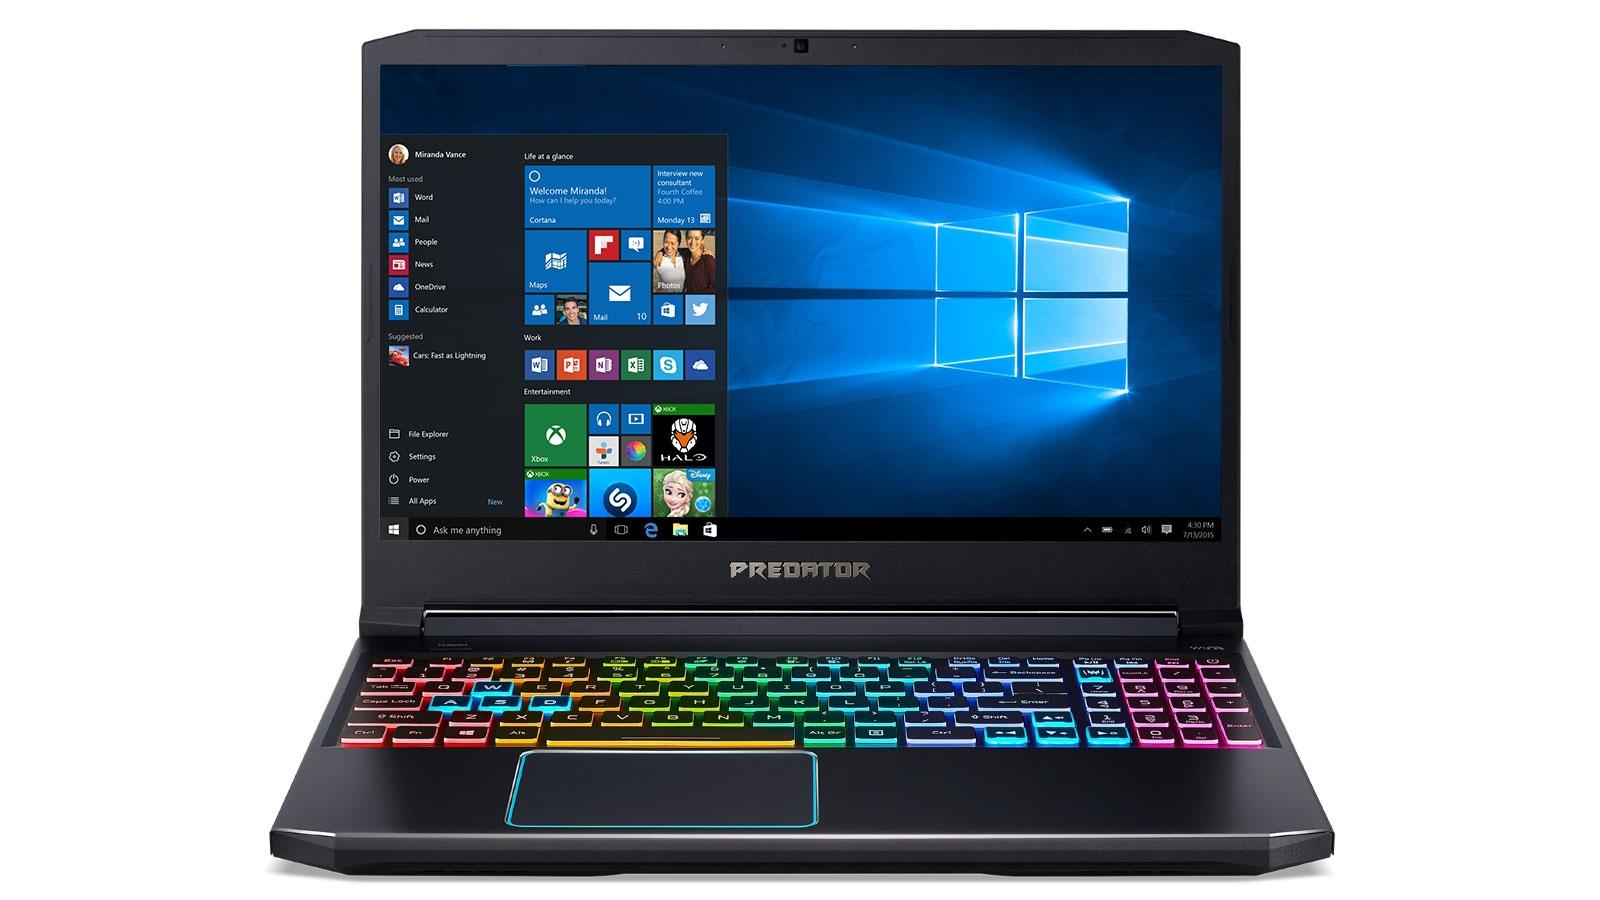 Predator Helios 300 15 6 Inch I7 16gb 256gb Ssd Laptop